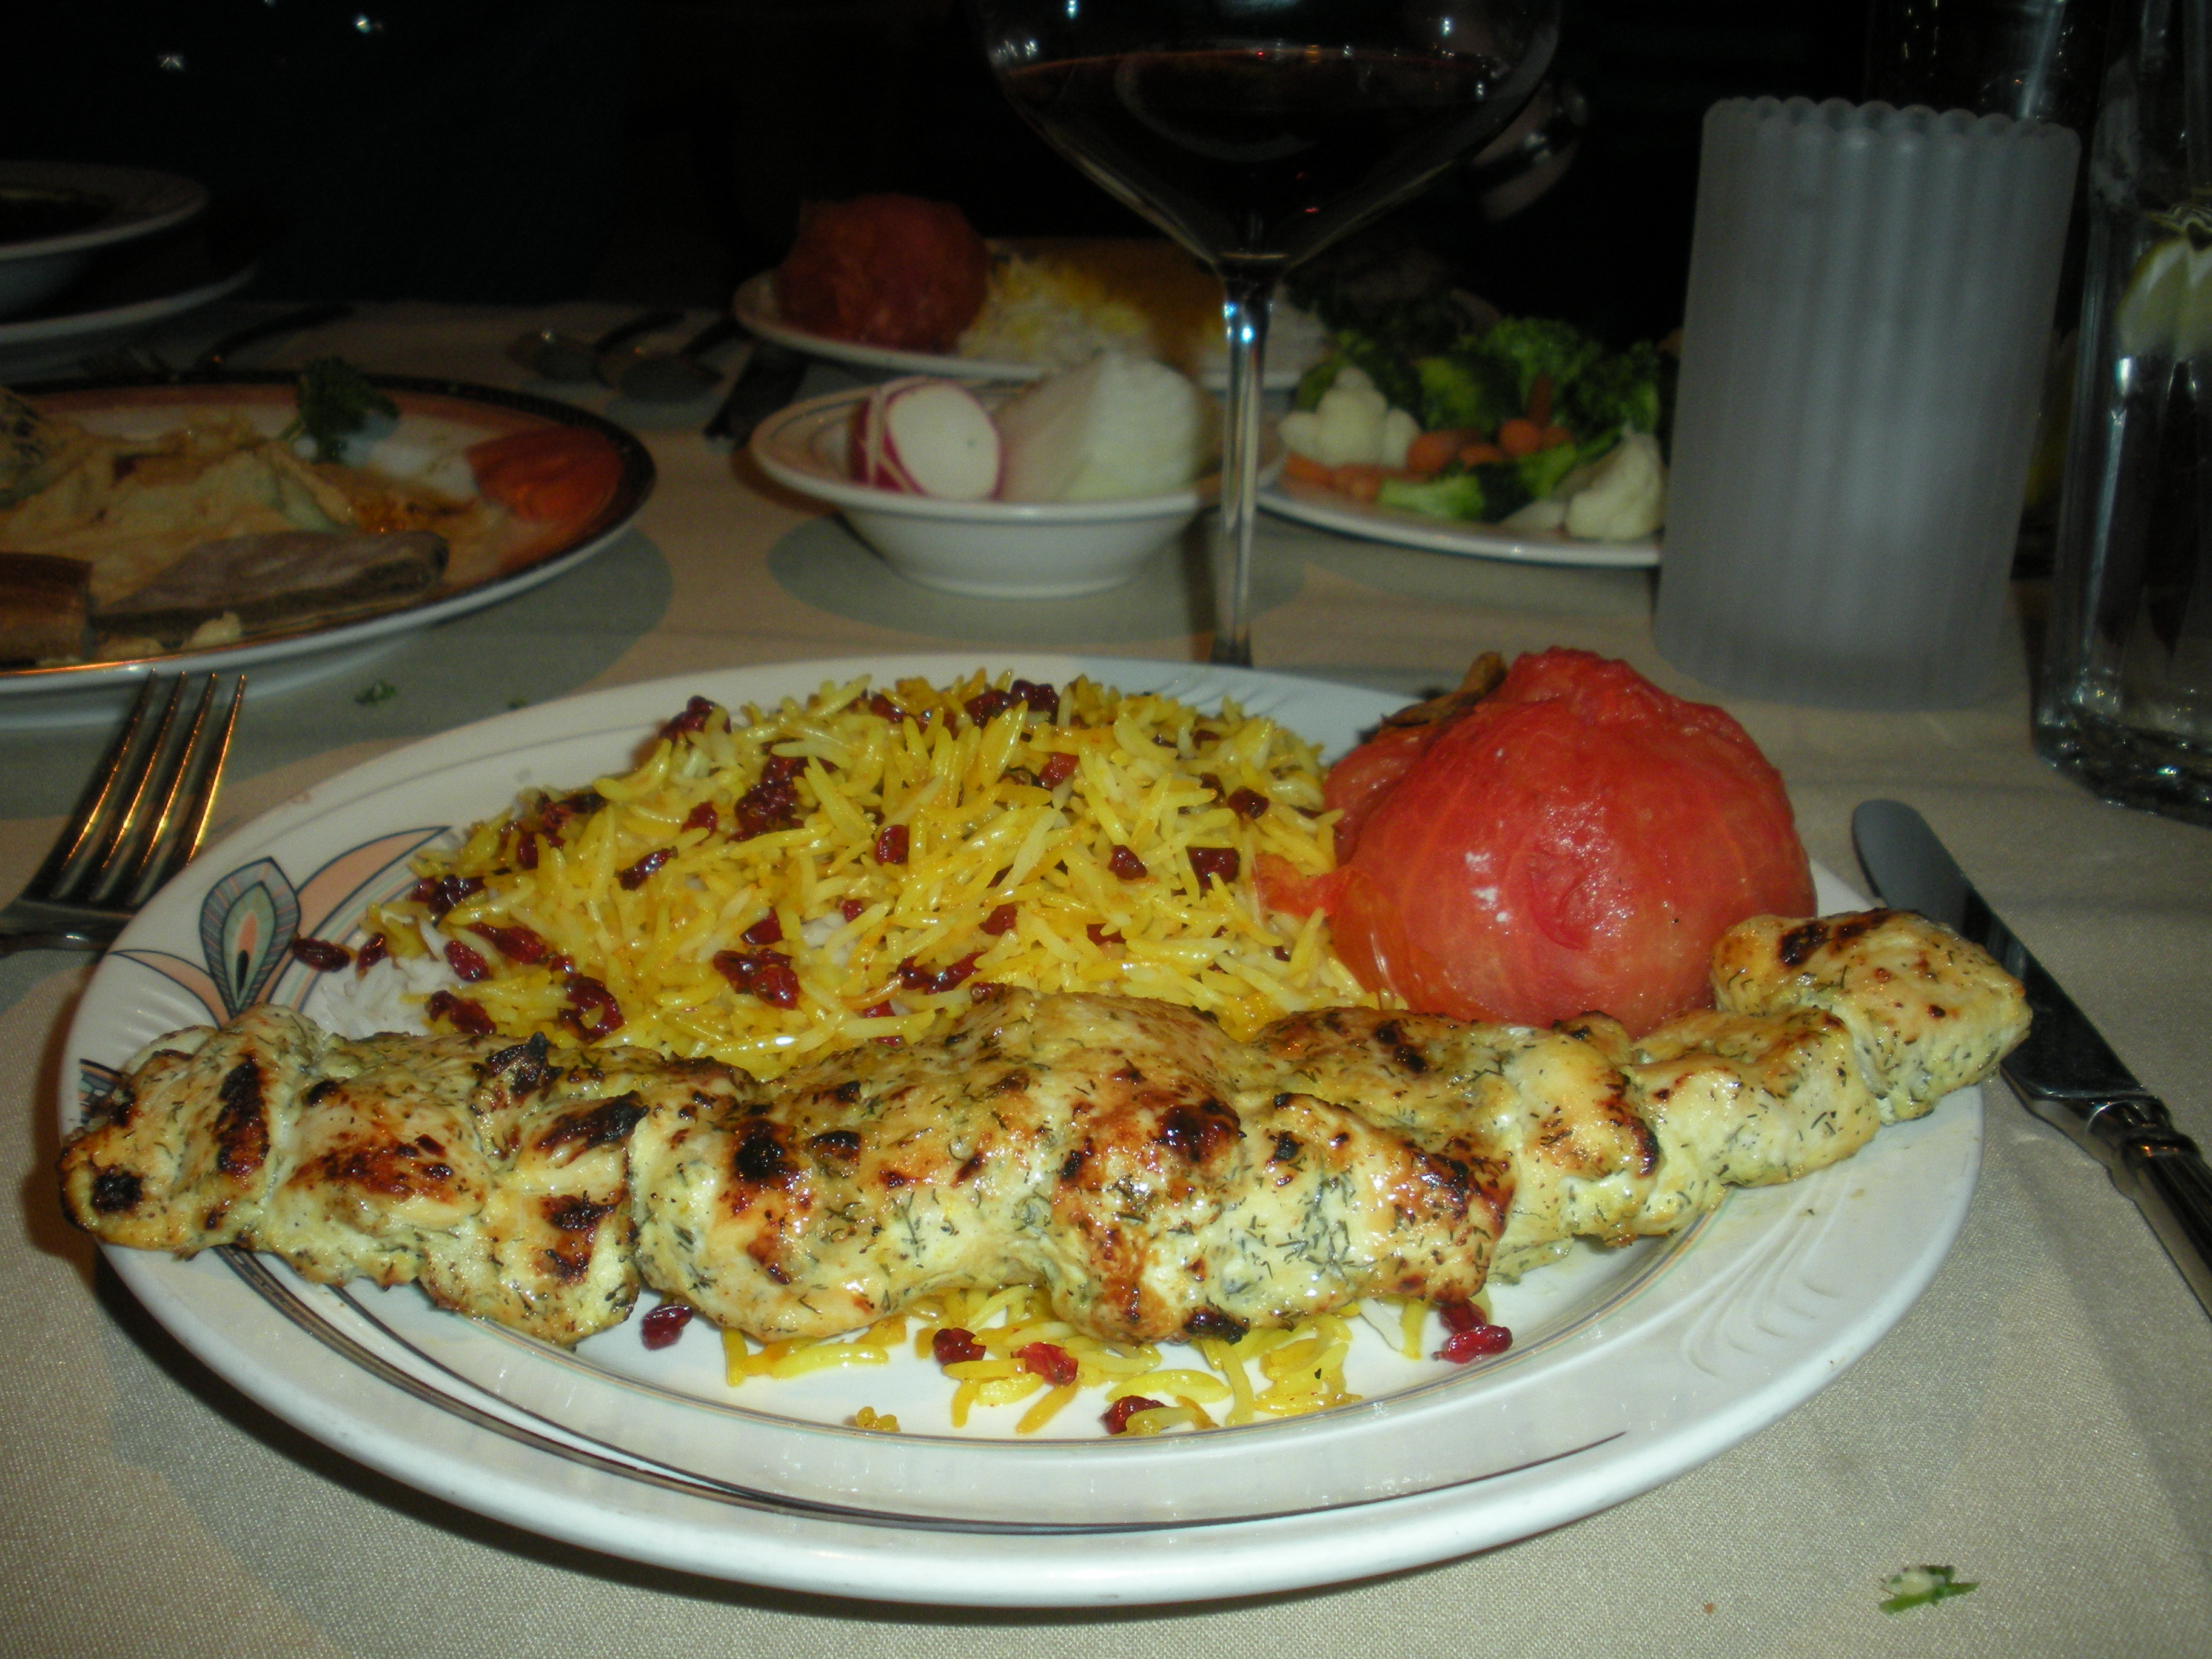 Lipstick Jihad + Habib\'s Persian Cuisine | Becky A. Johnson